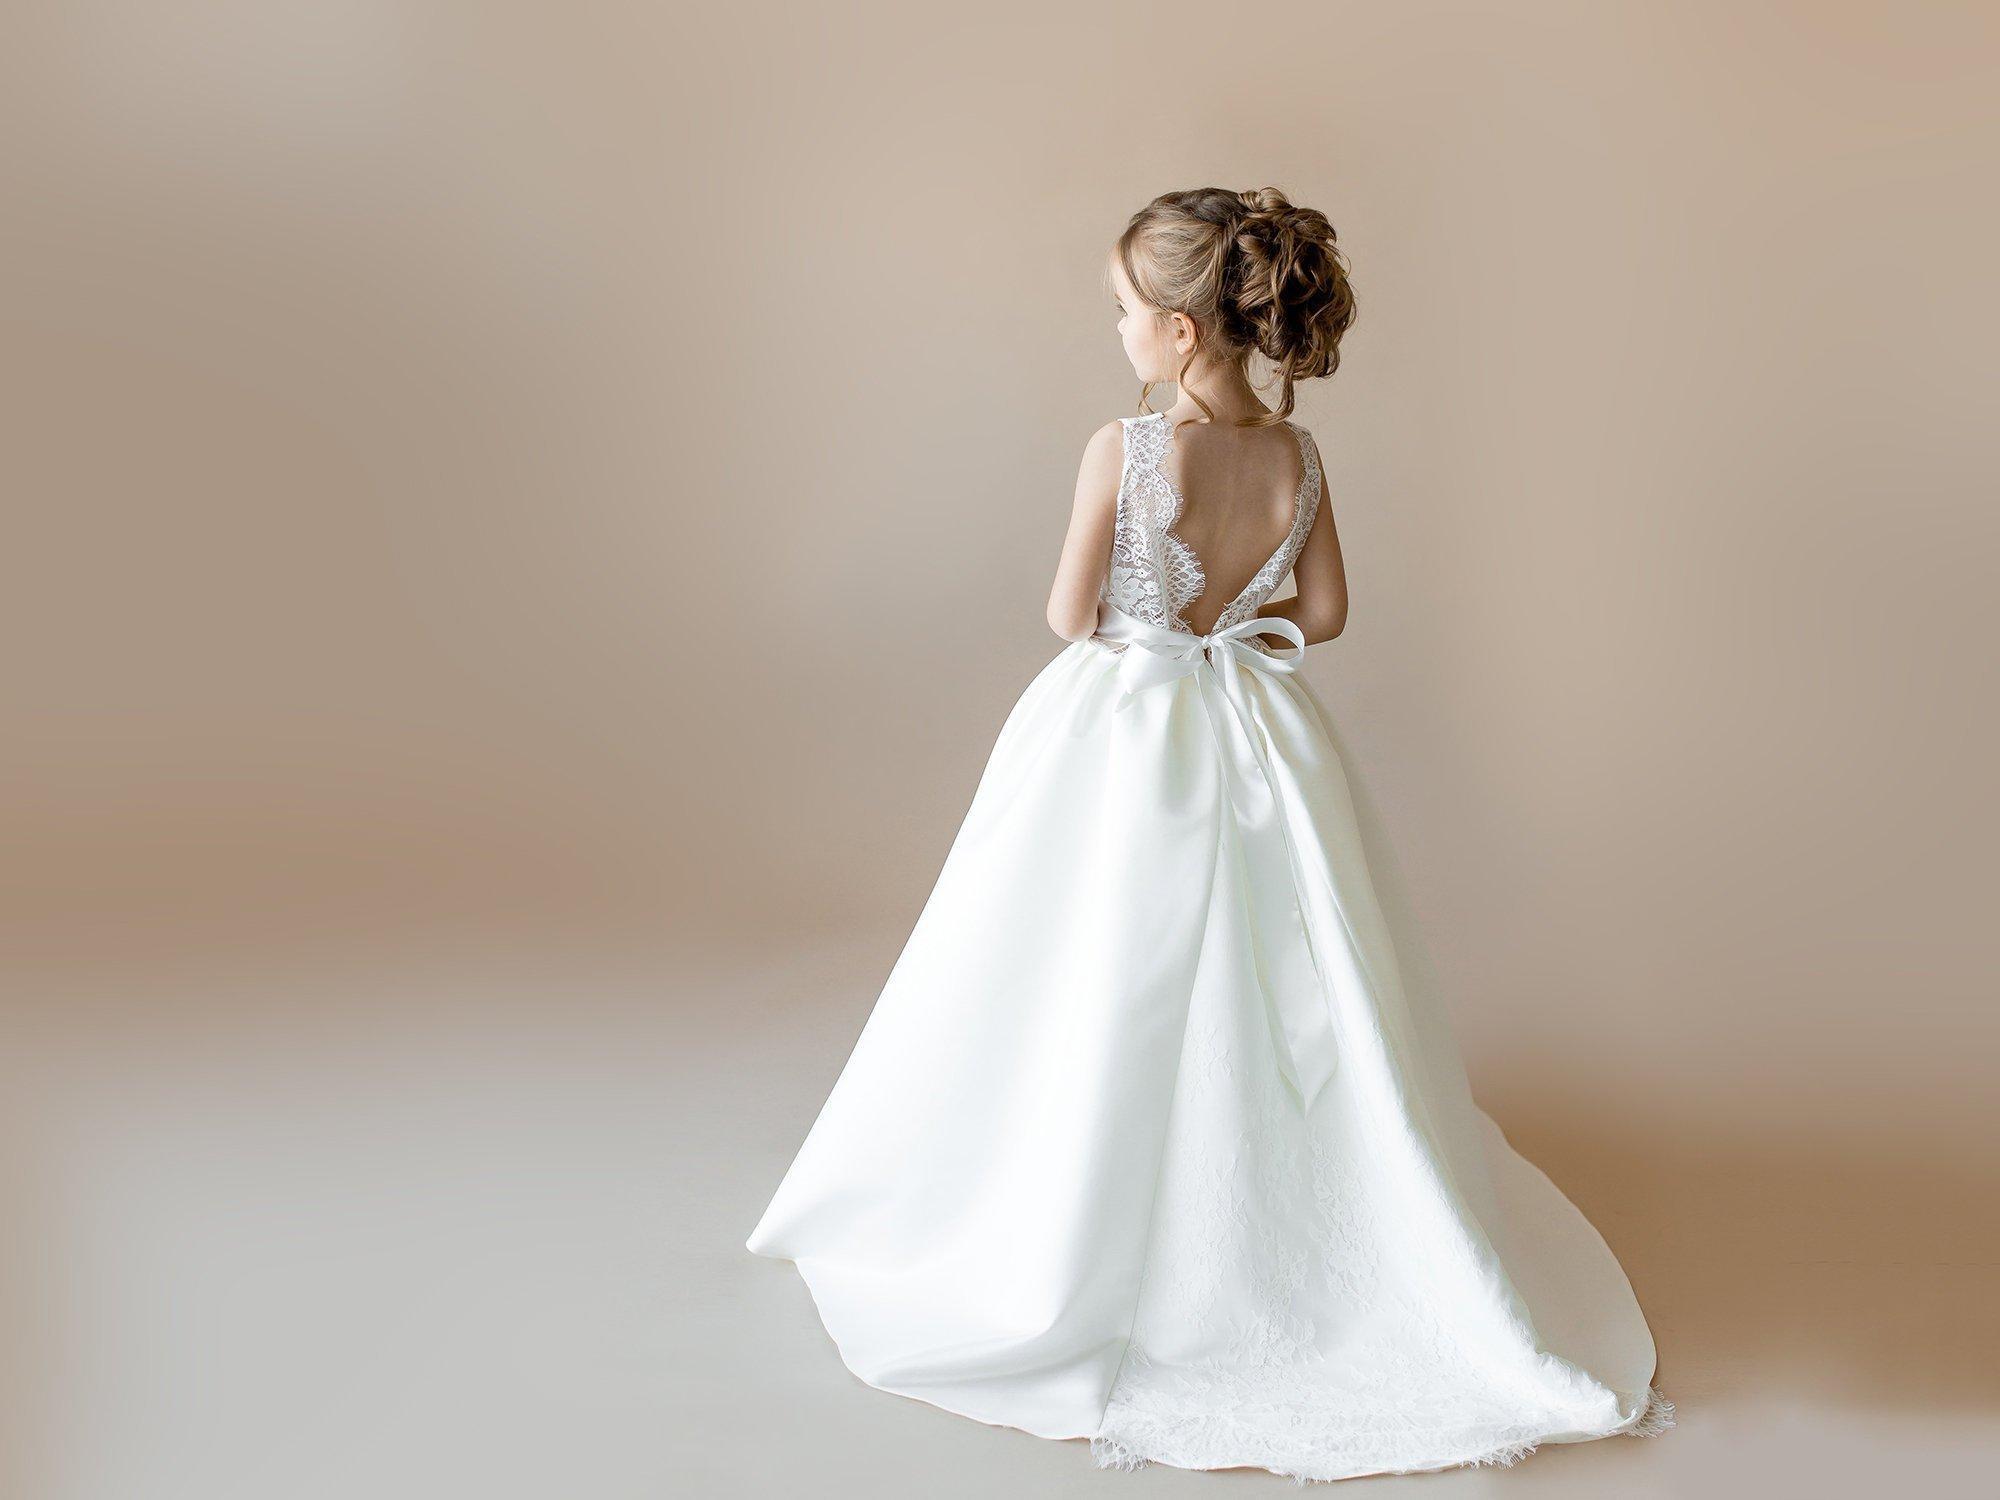 White Flower Flower Girl avorio con treno Junior damigella d'onore Lace Baby Tulle dress Wedding Formal Occasion Tutu Kids Skirt